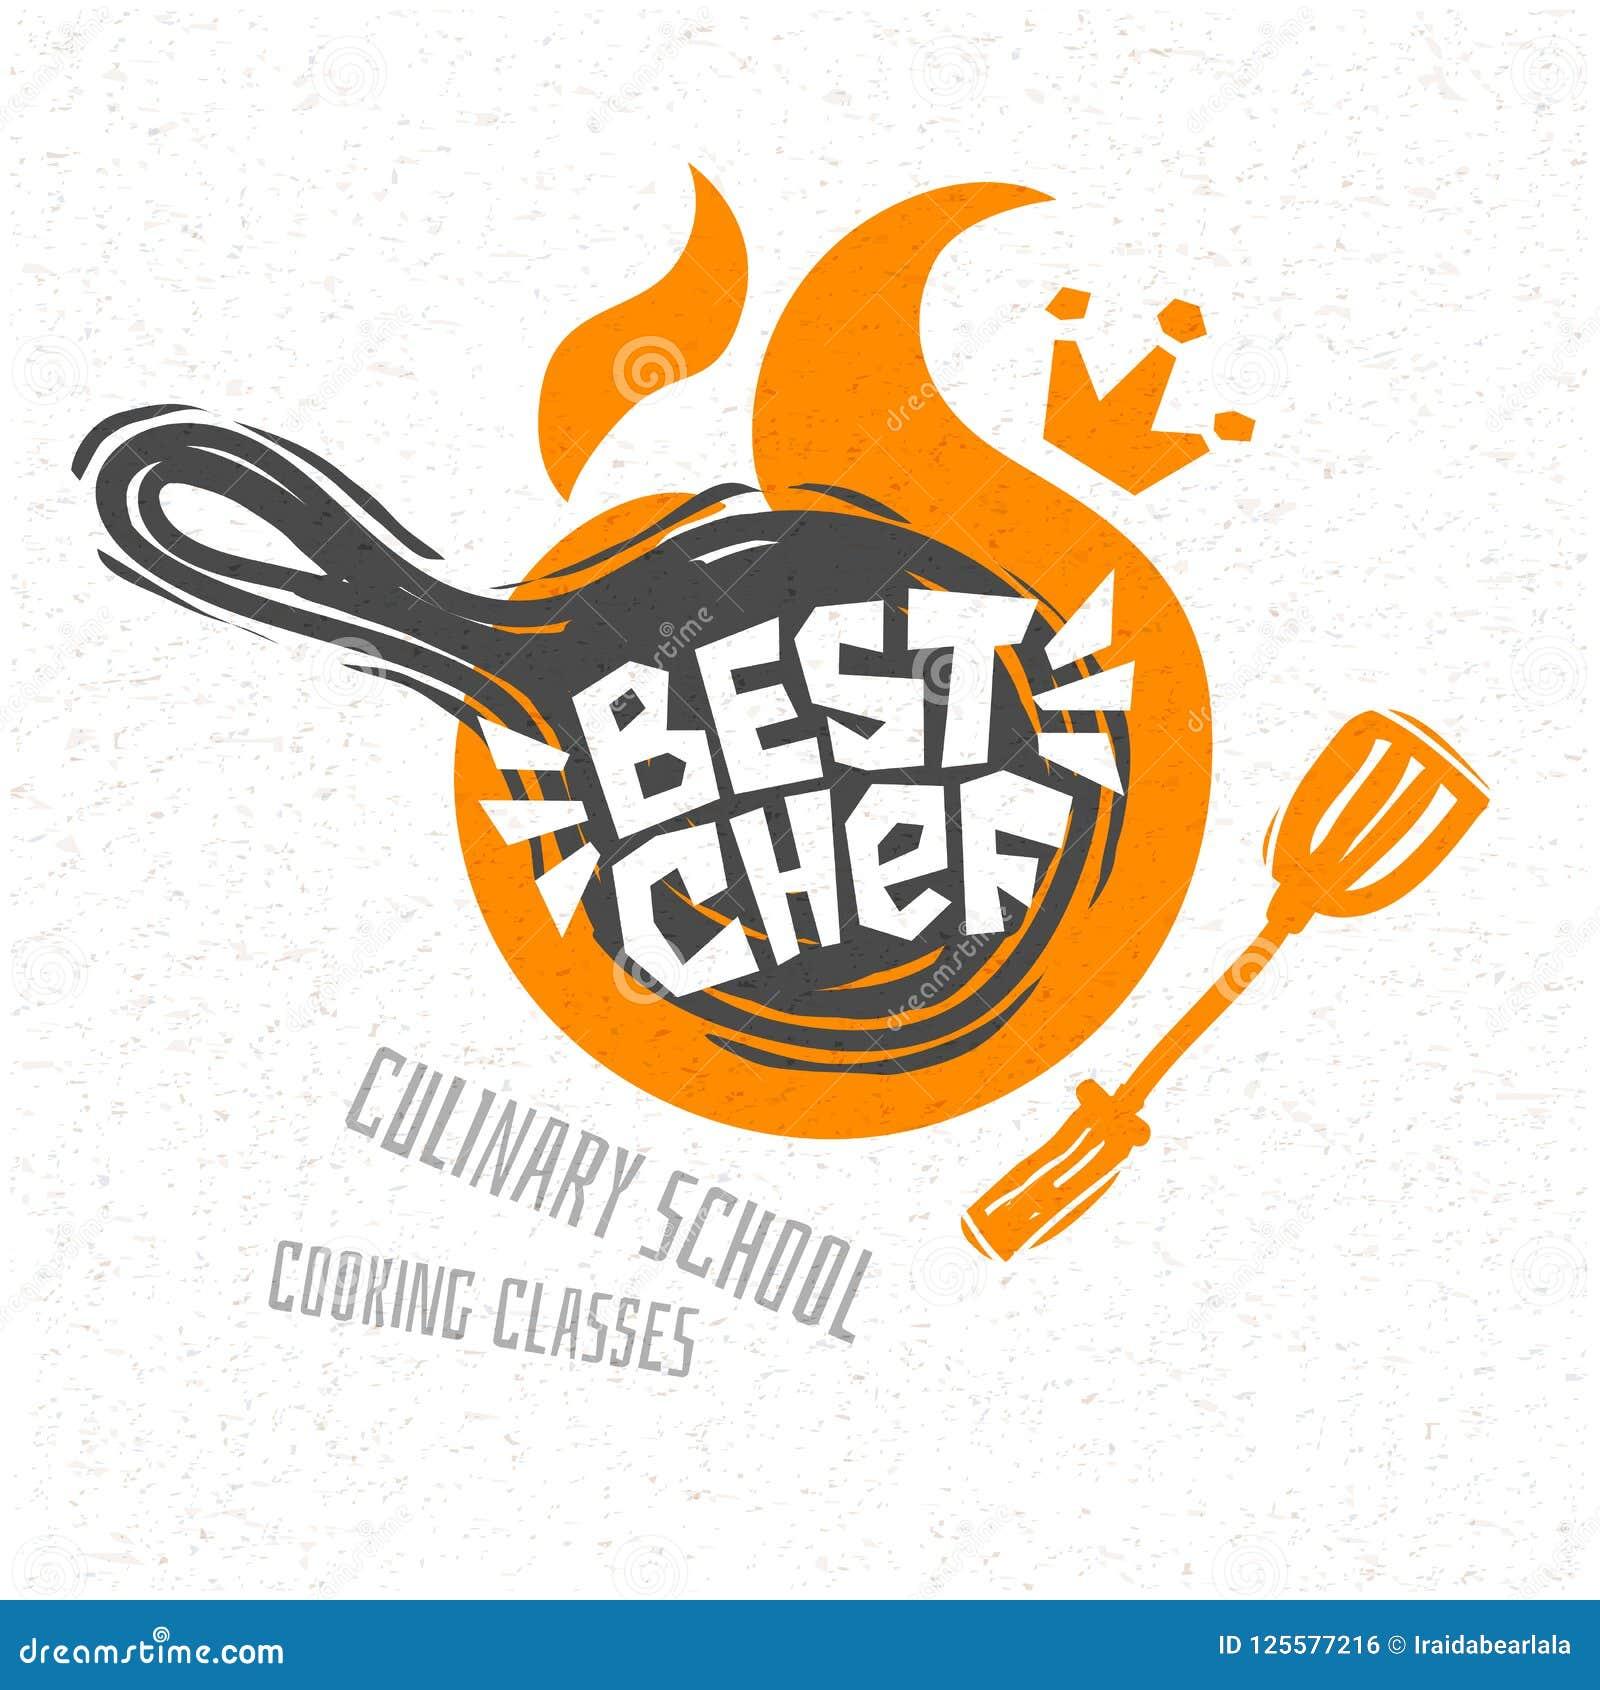 Варить школу, кулинарные классы, студия, логотип, утвари, рисберма, вилка, нож, шеф-повар